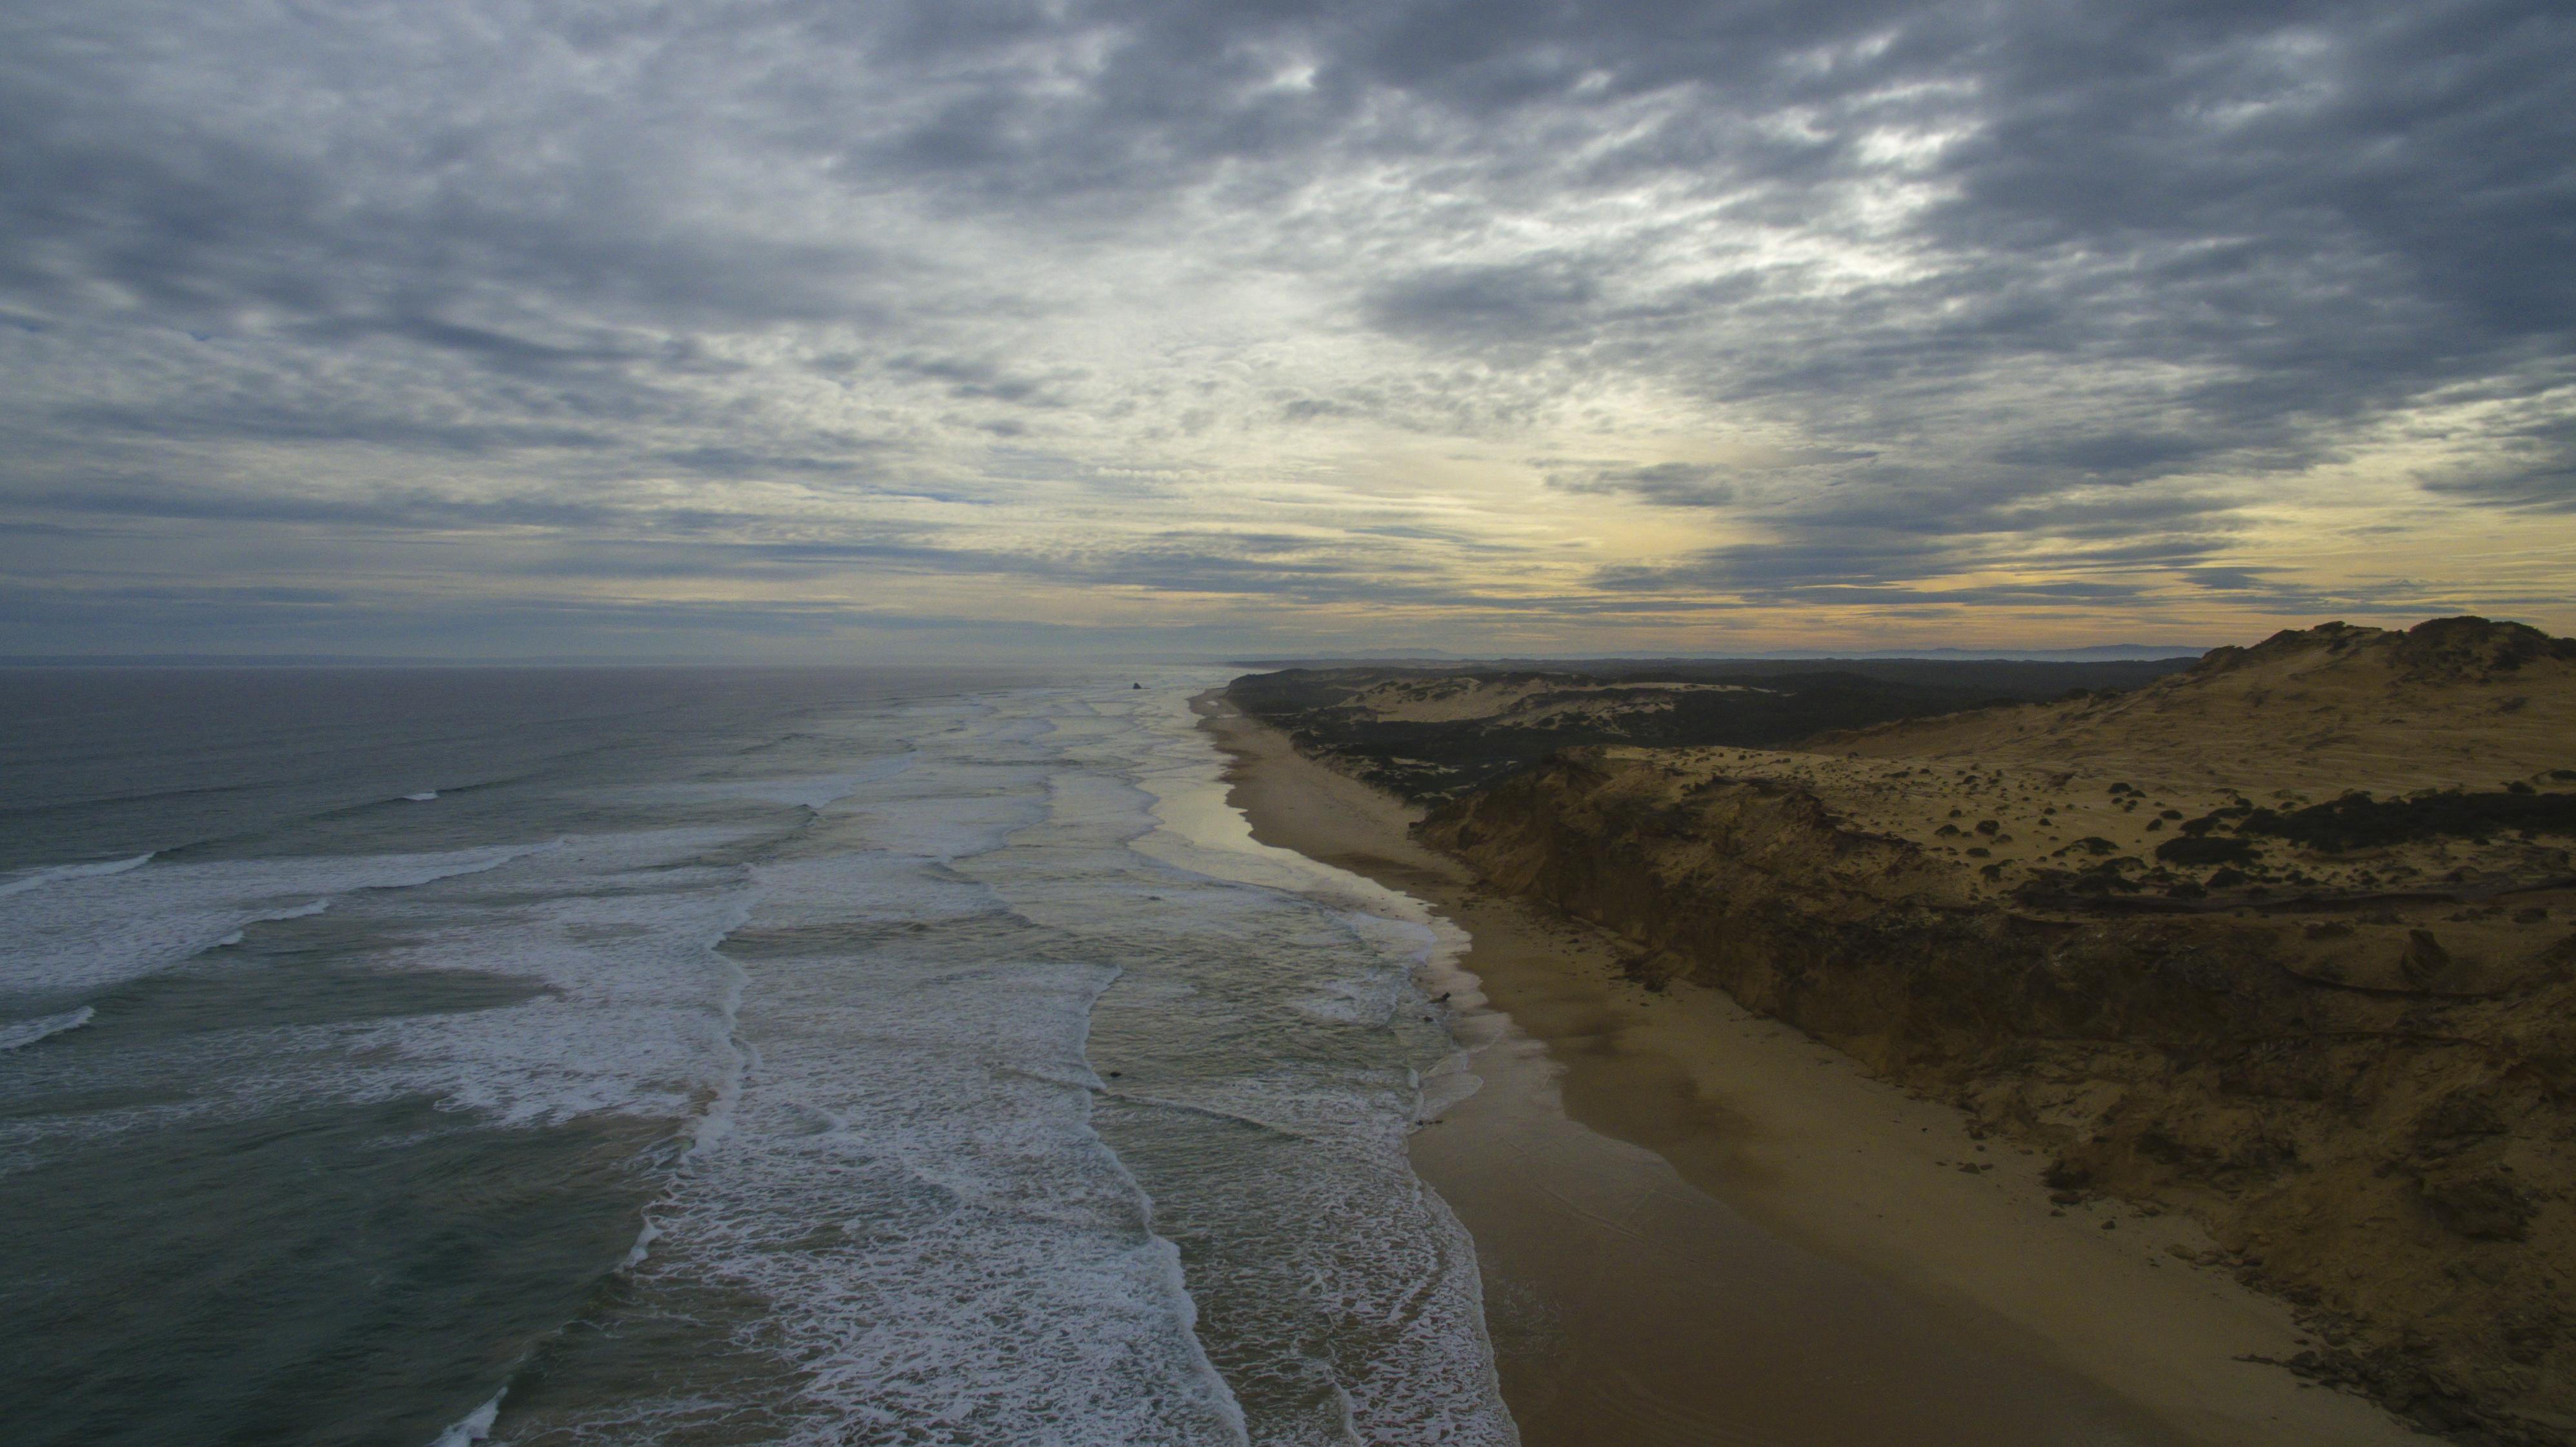 Darby Beach, Wilsons Promontory